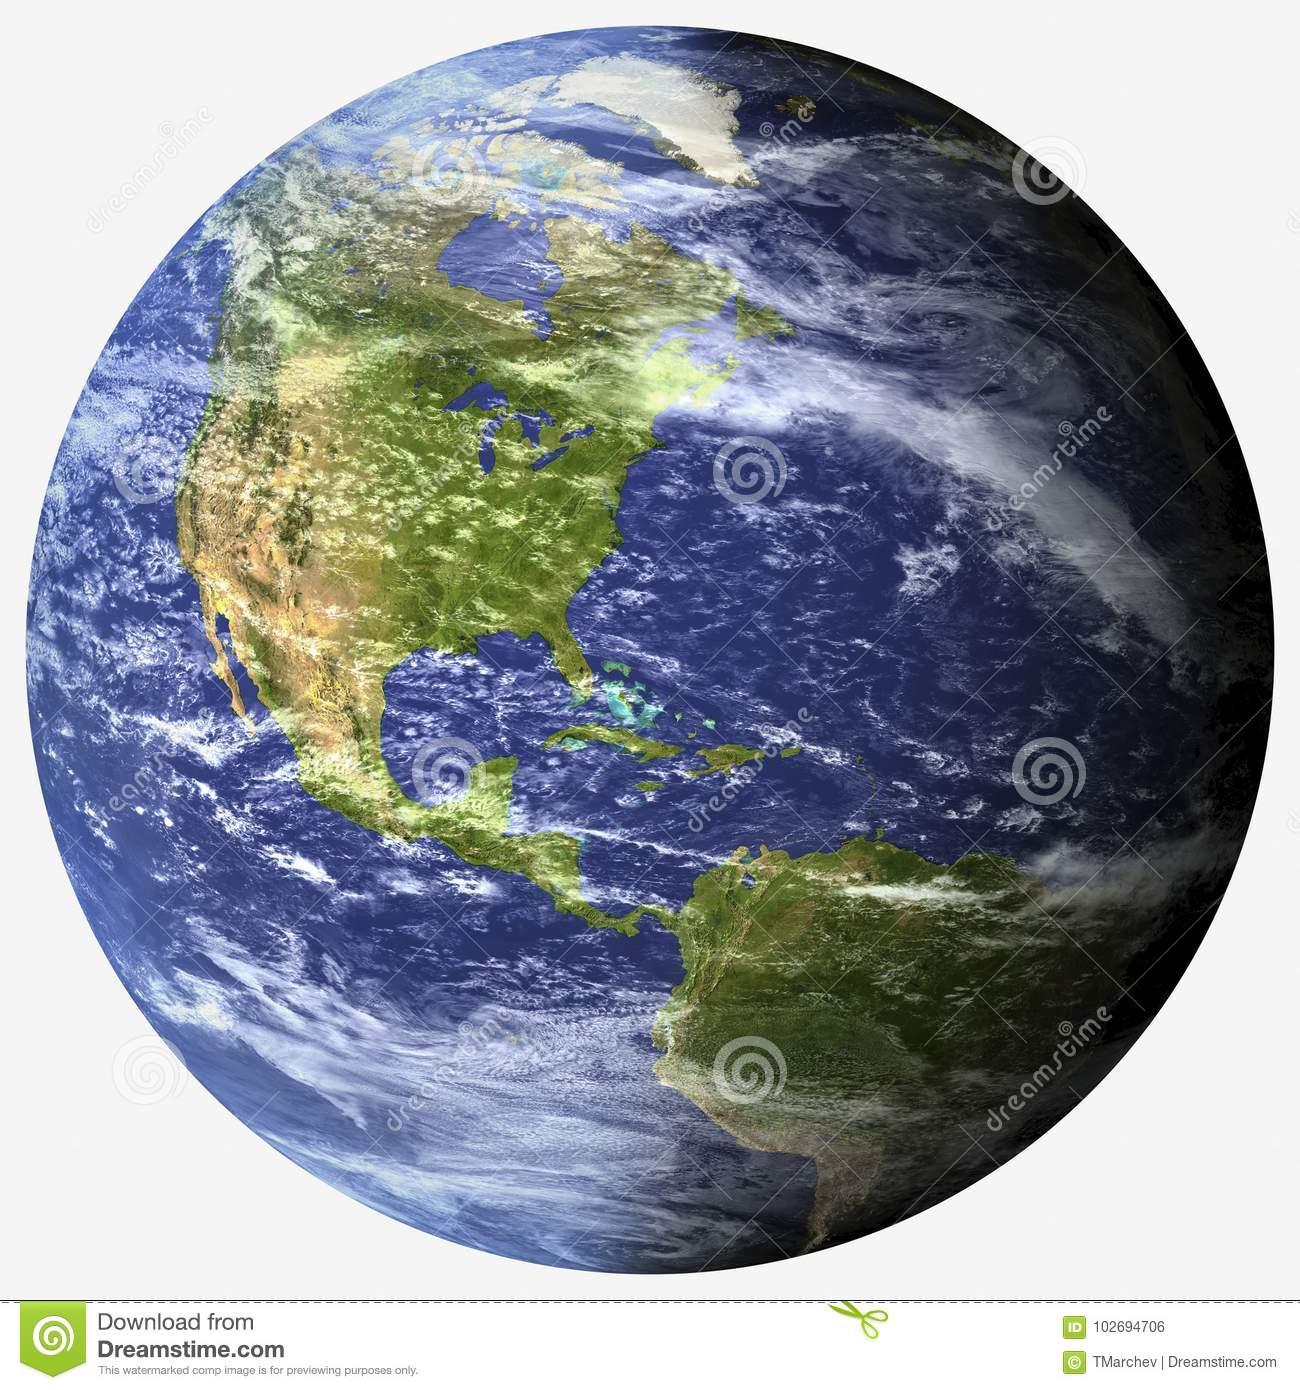 Photorealistic Planet Earth.